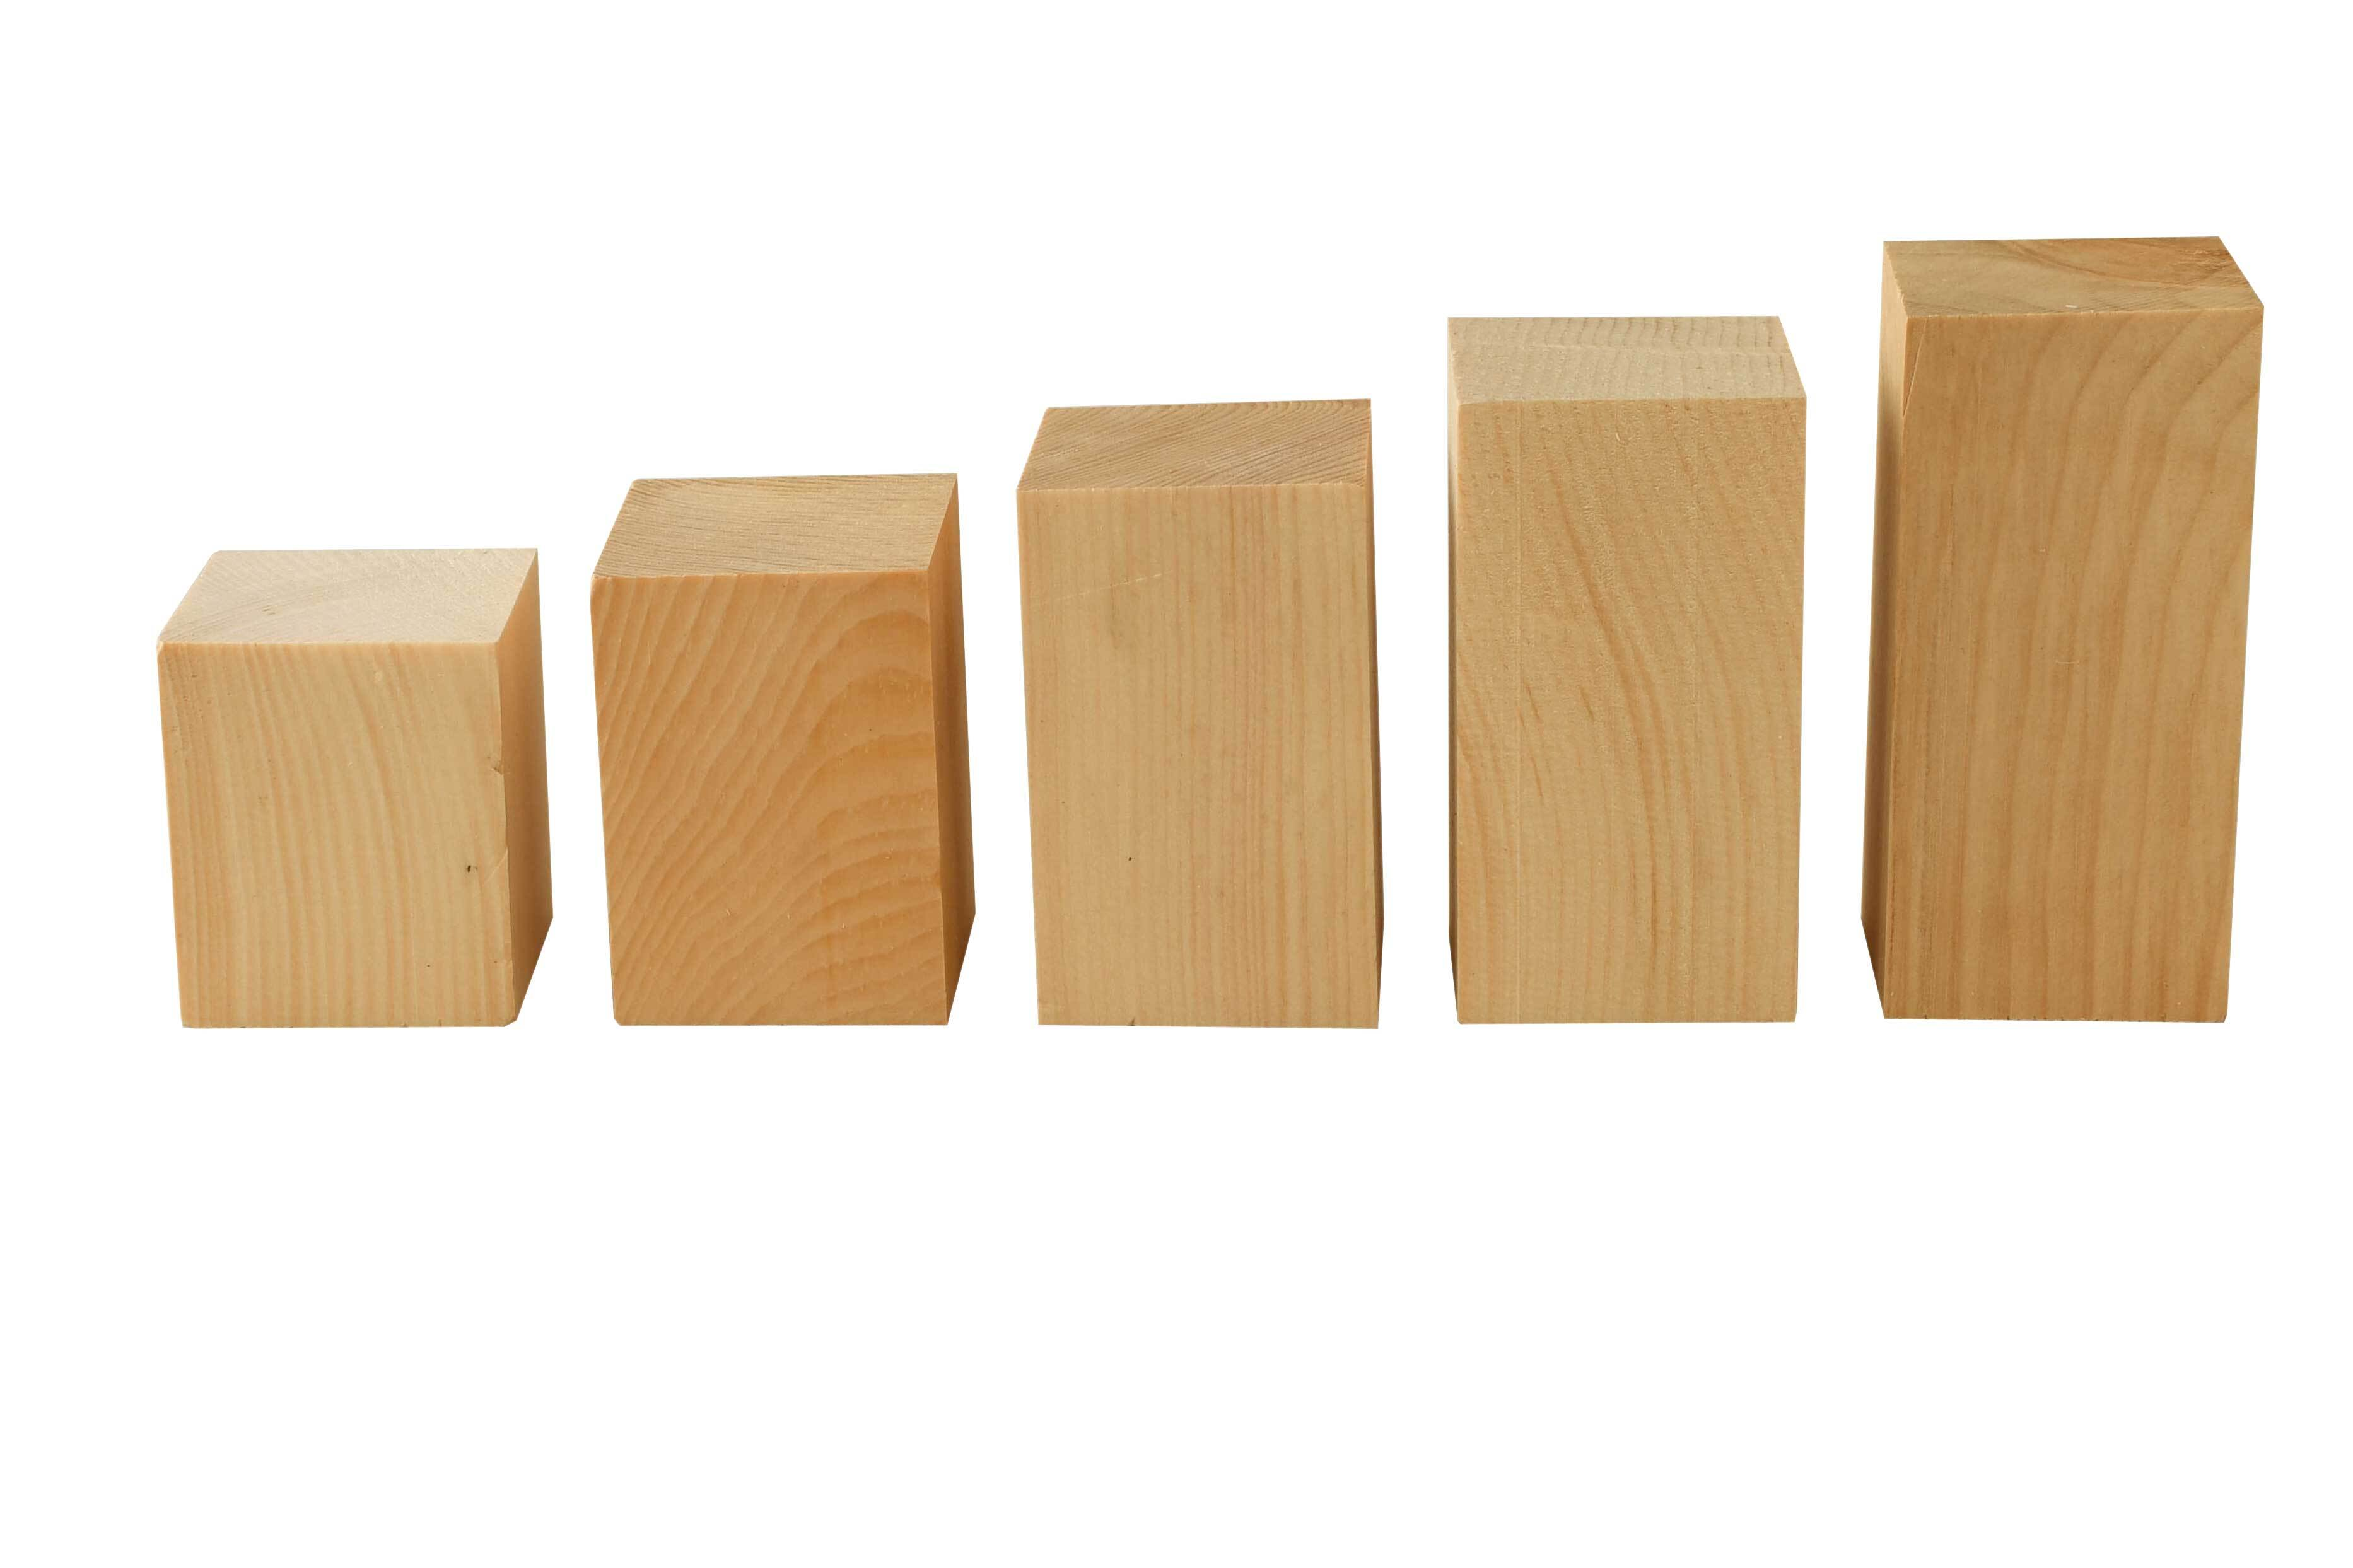 Blocs de construction en pin Cembro - 0,5 kg,4,2cm